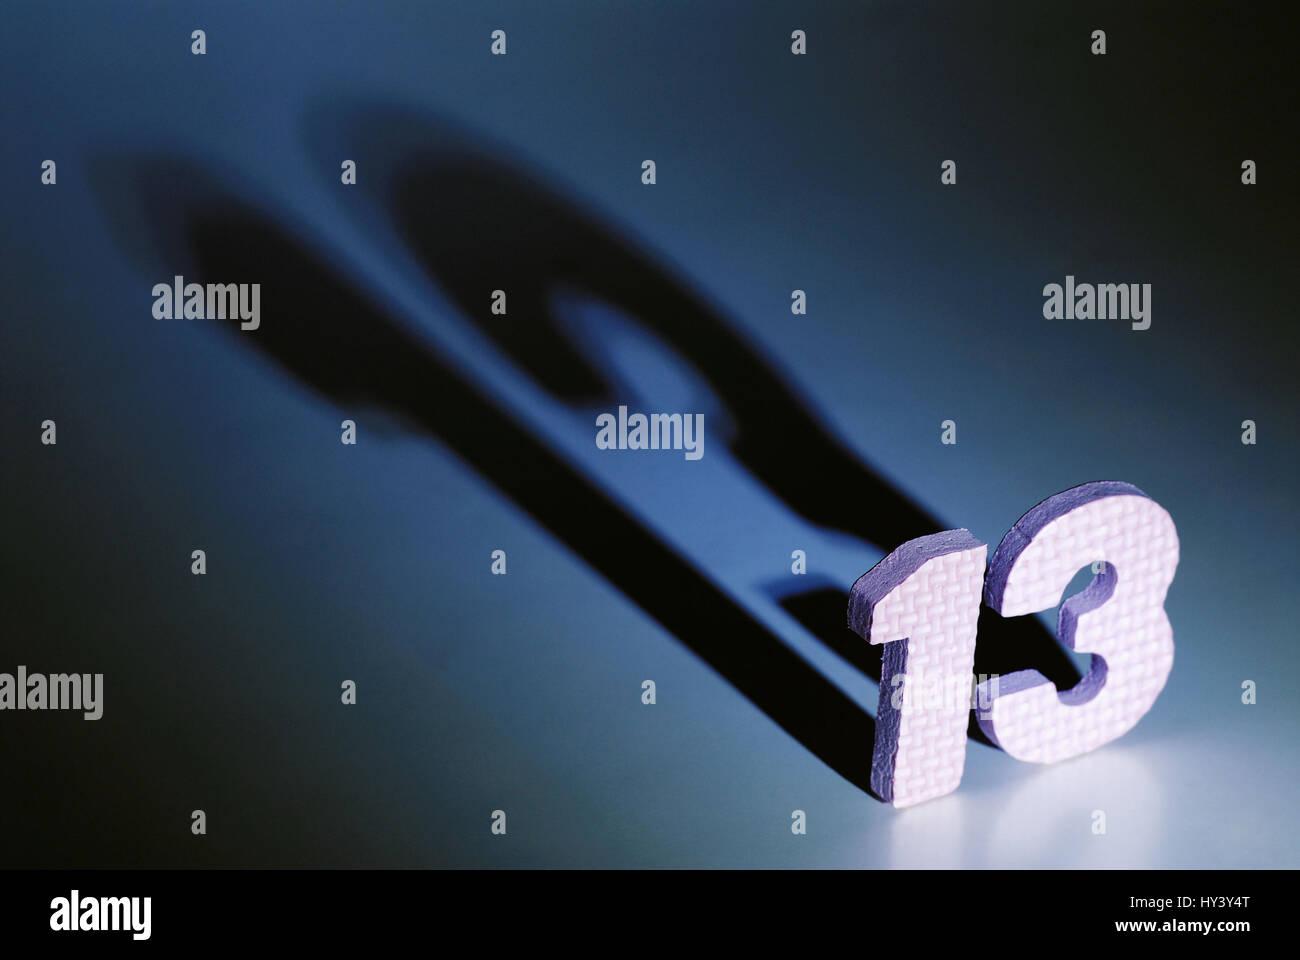 Number 13, Zahl 13 - Stock Image